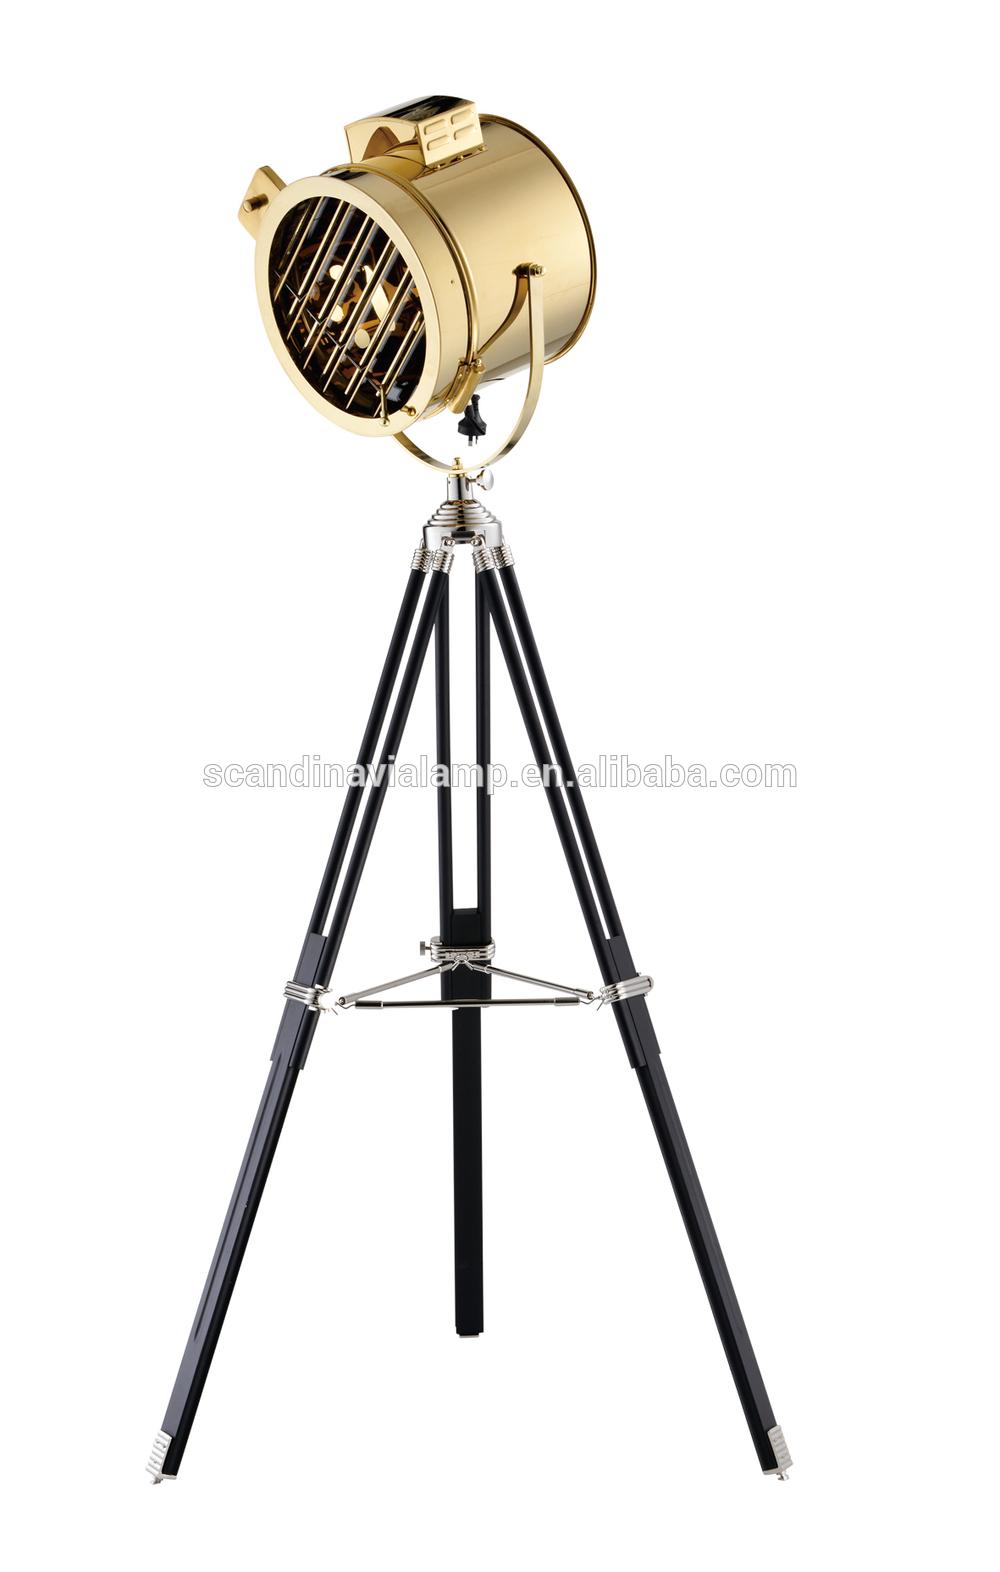 Royal master sealight floor lamp - Royal Master Sealight Floor Lamp Photo 4